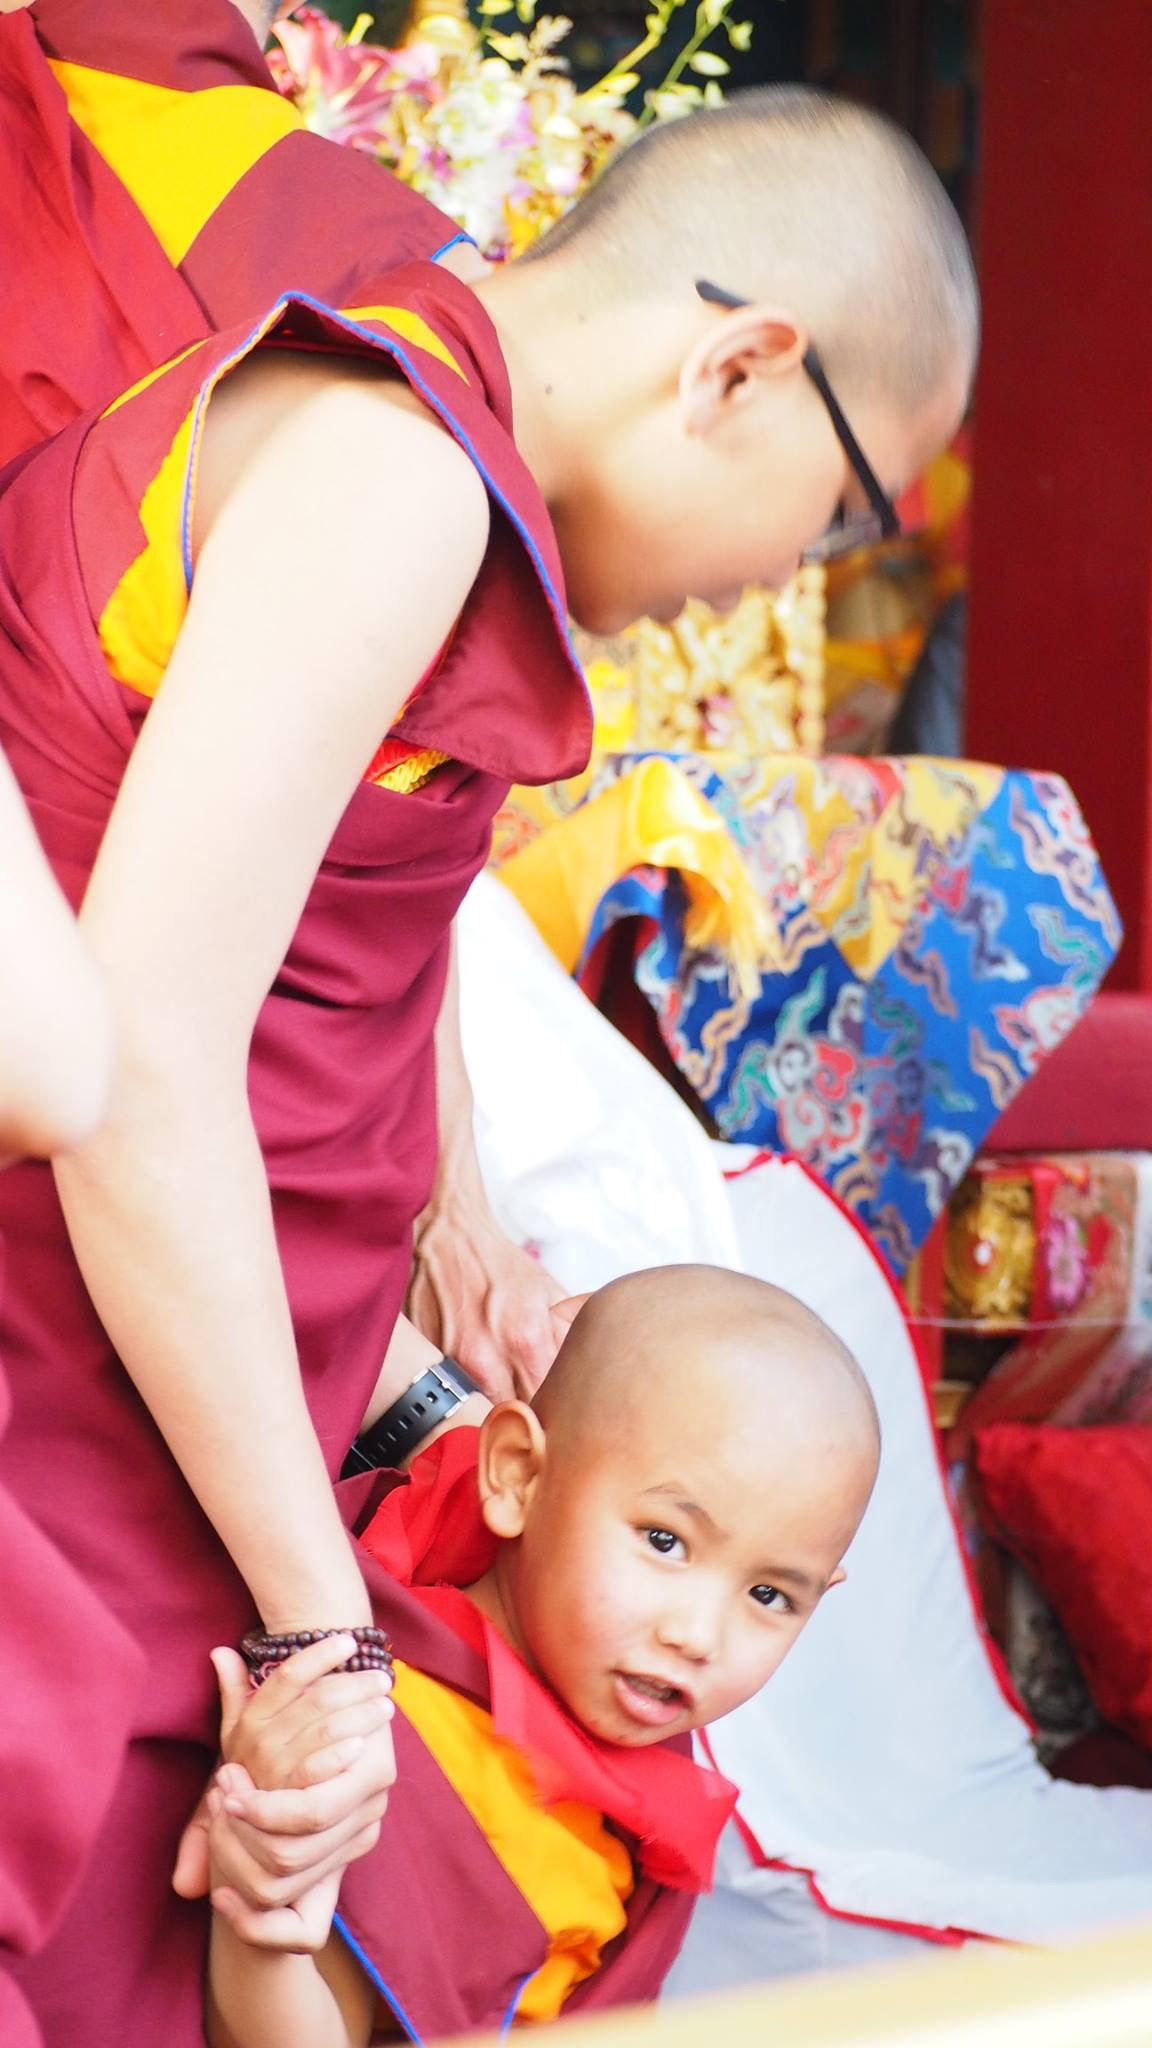 The reincarnation of Kopan abbot Lama Lhundrup with his brother the reincarnation of Geshe Lama Konchog. (Photo Ven Tenzin Tsultrim)